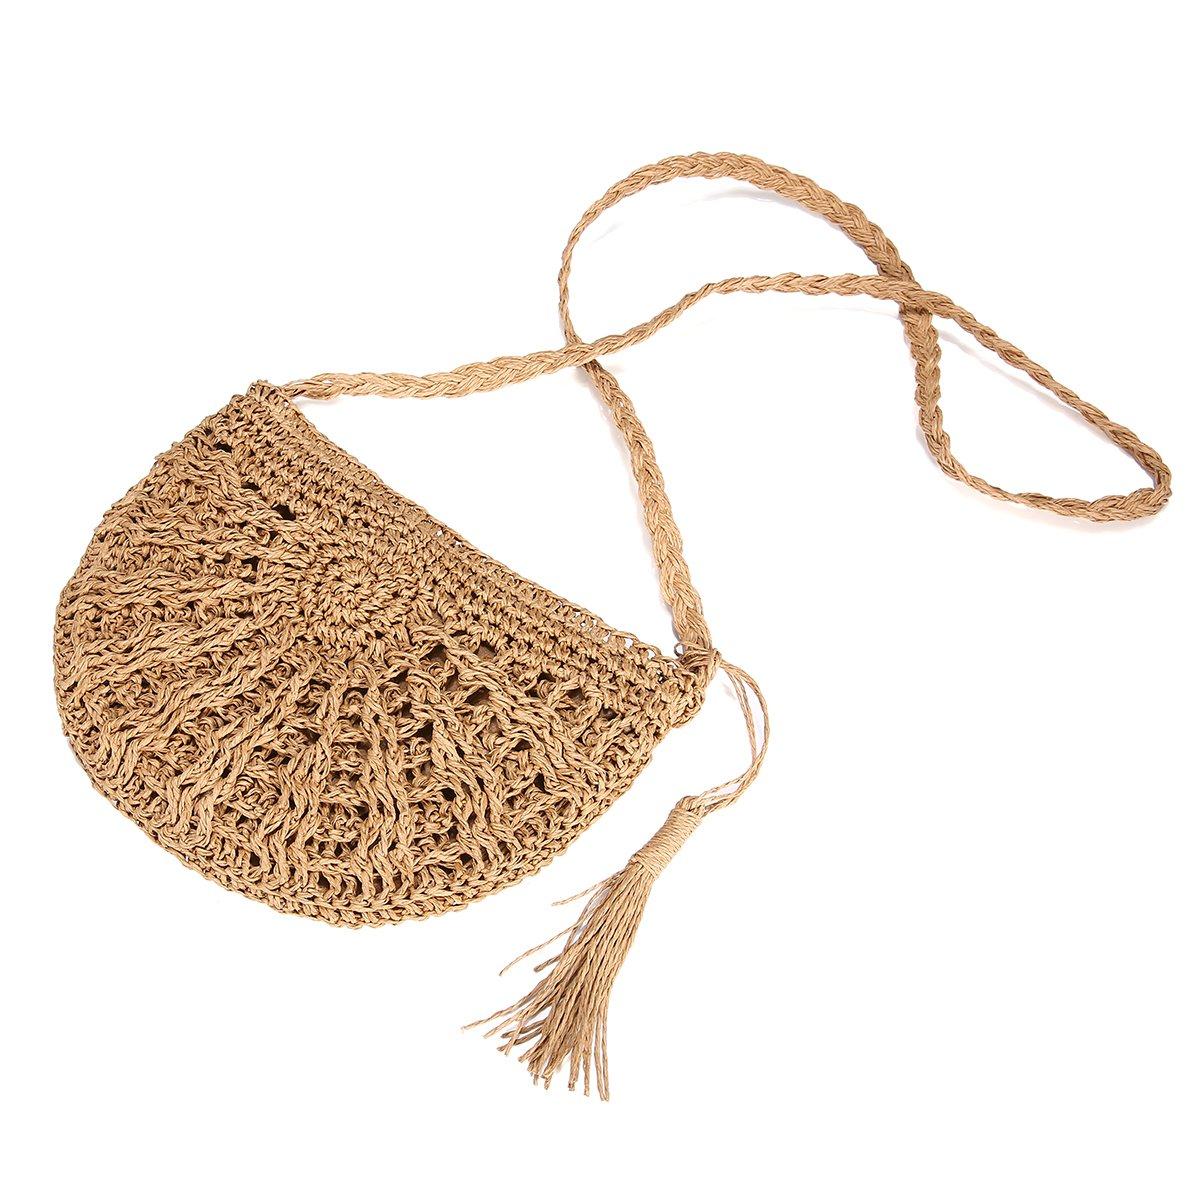 Straw Crossbody Bag, JOSEKO Women Weave Shoulder Bag Summer Beach Purse for Travel Everyday Use Khaki 28 x 15 x 26cm(L x W x H)